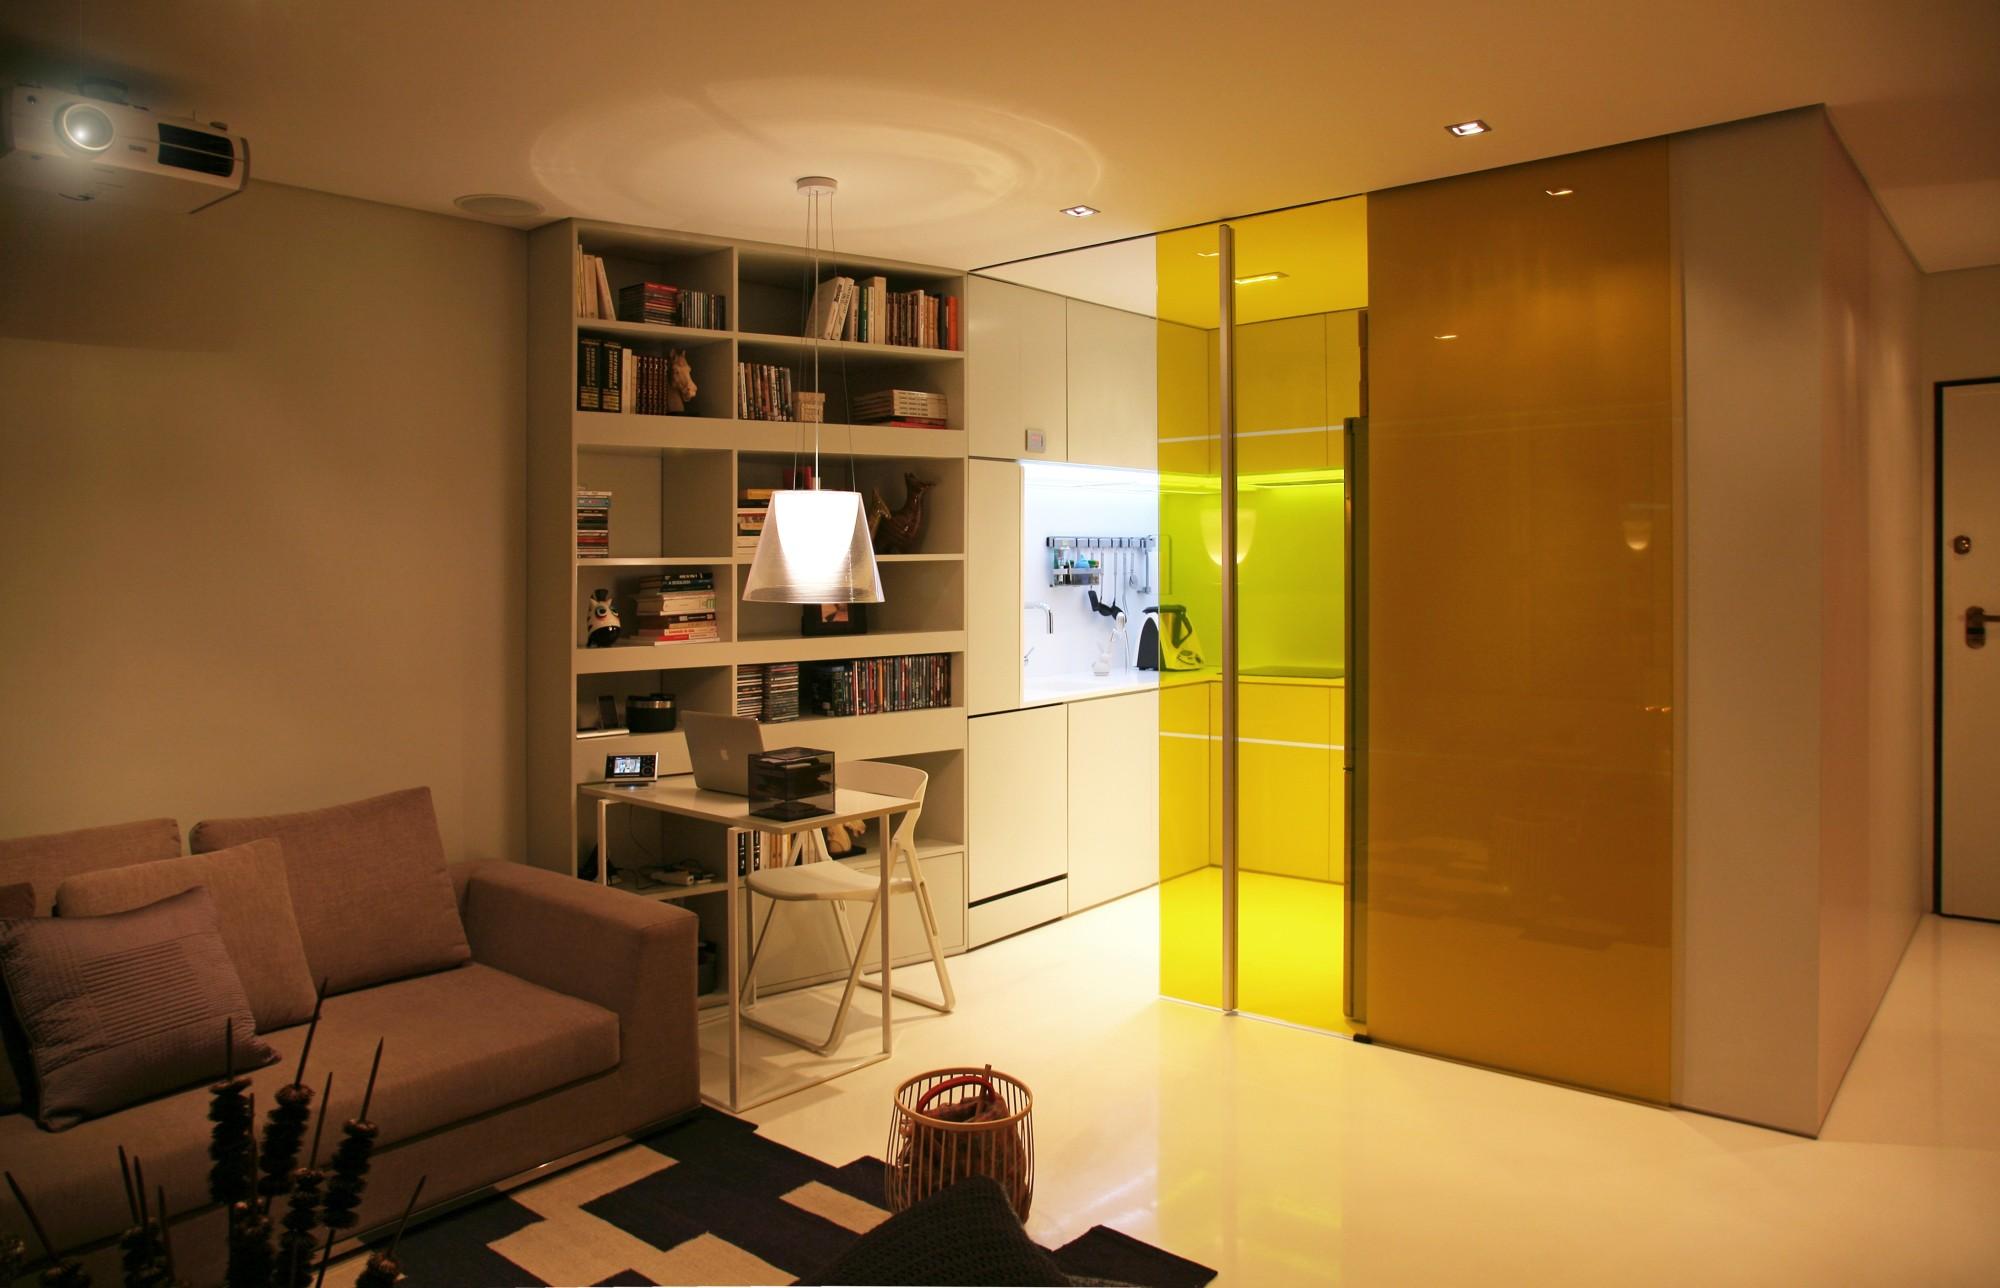 интерьер комнаты 12 квм 50 фото особенности зонирования материалы